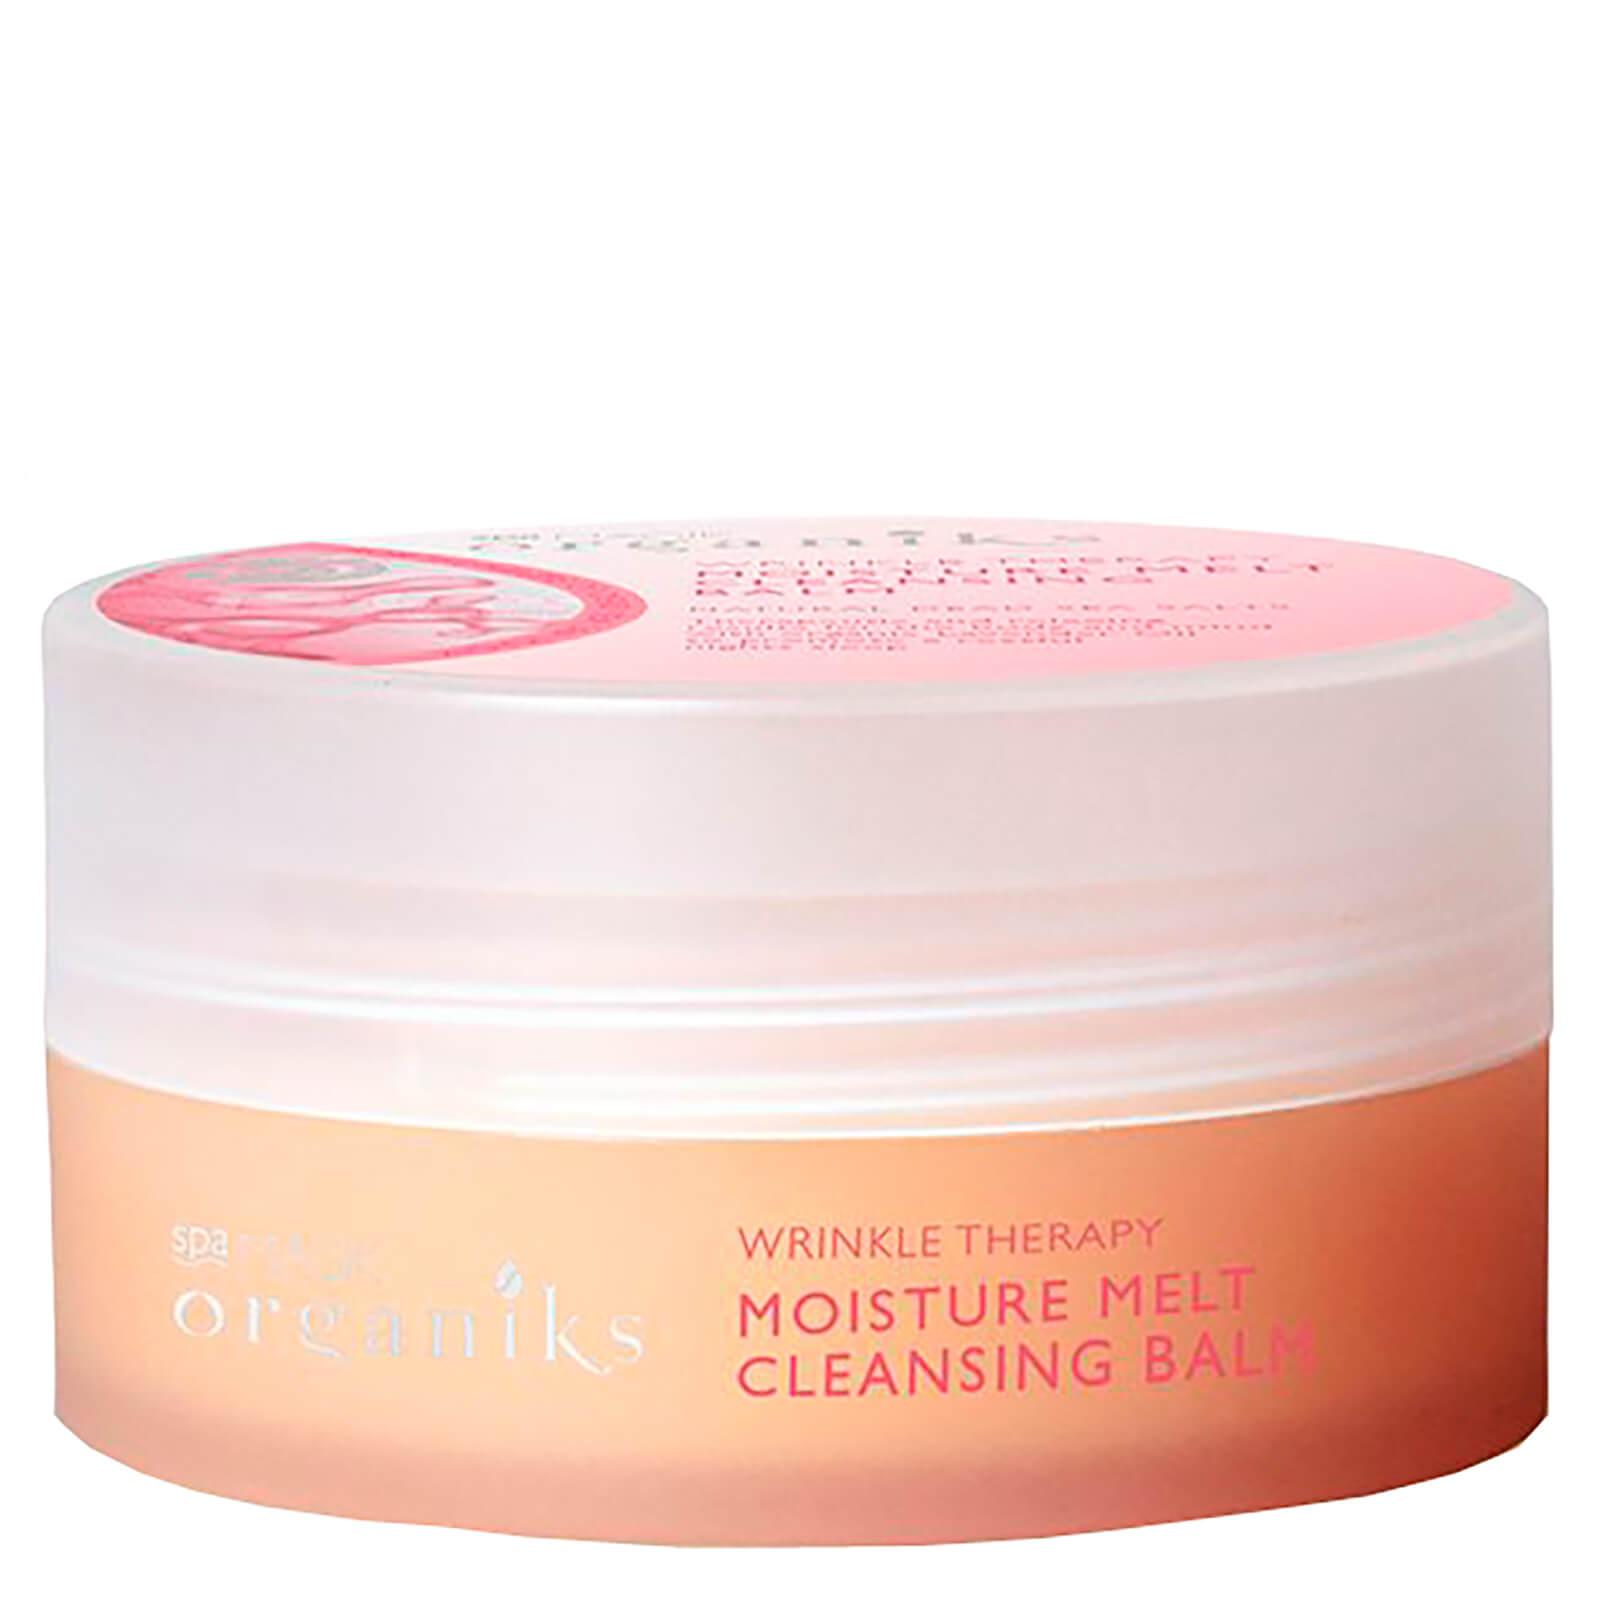 Купить Очищающий увлажняющий бальзам для лица Spa Magik Organiks Wrinkle Therapy Moisture Melt Cleansing Balm